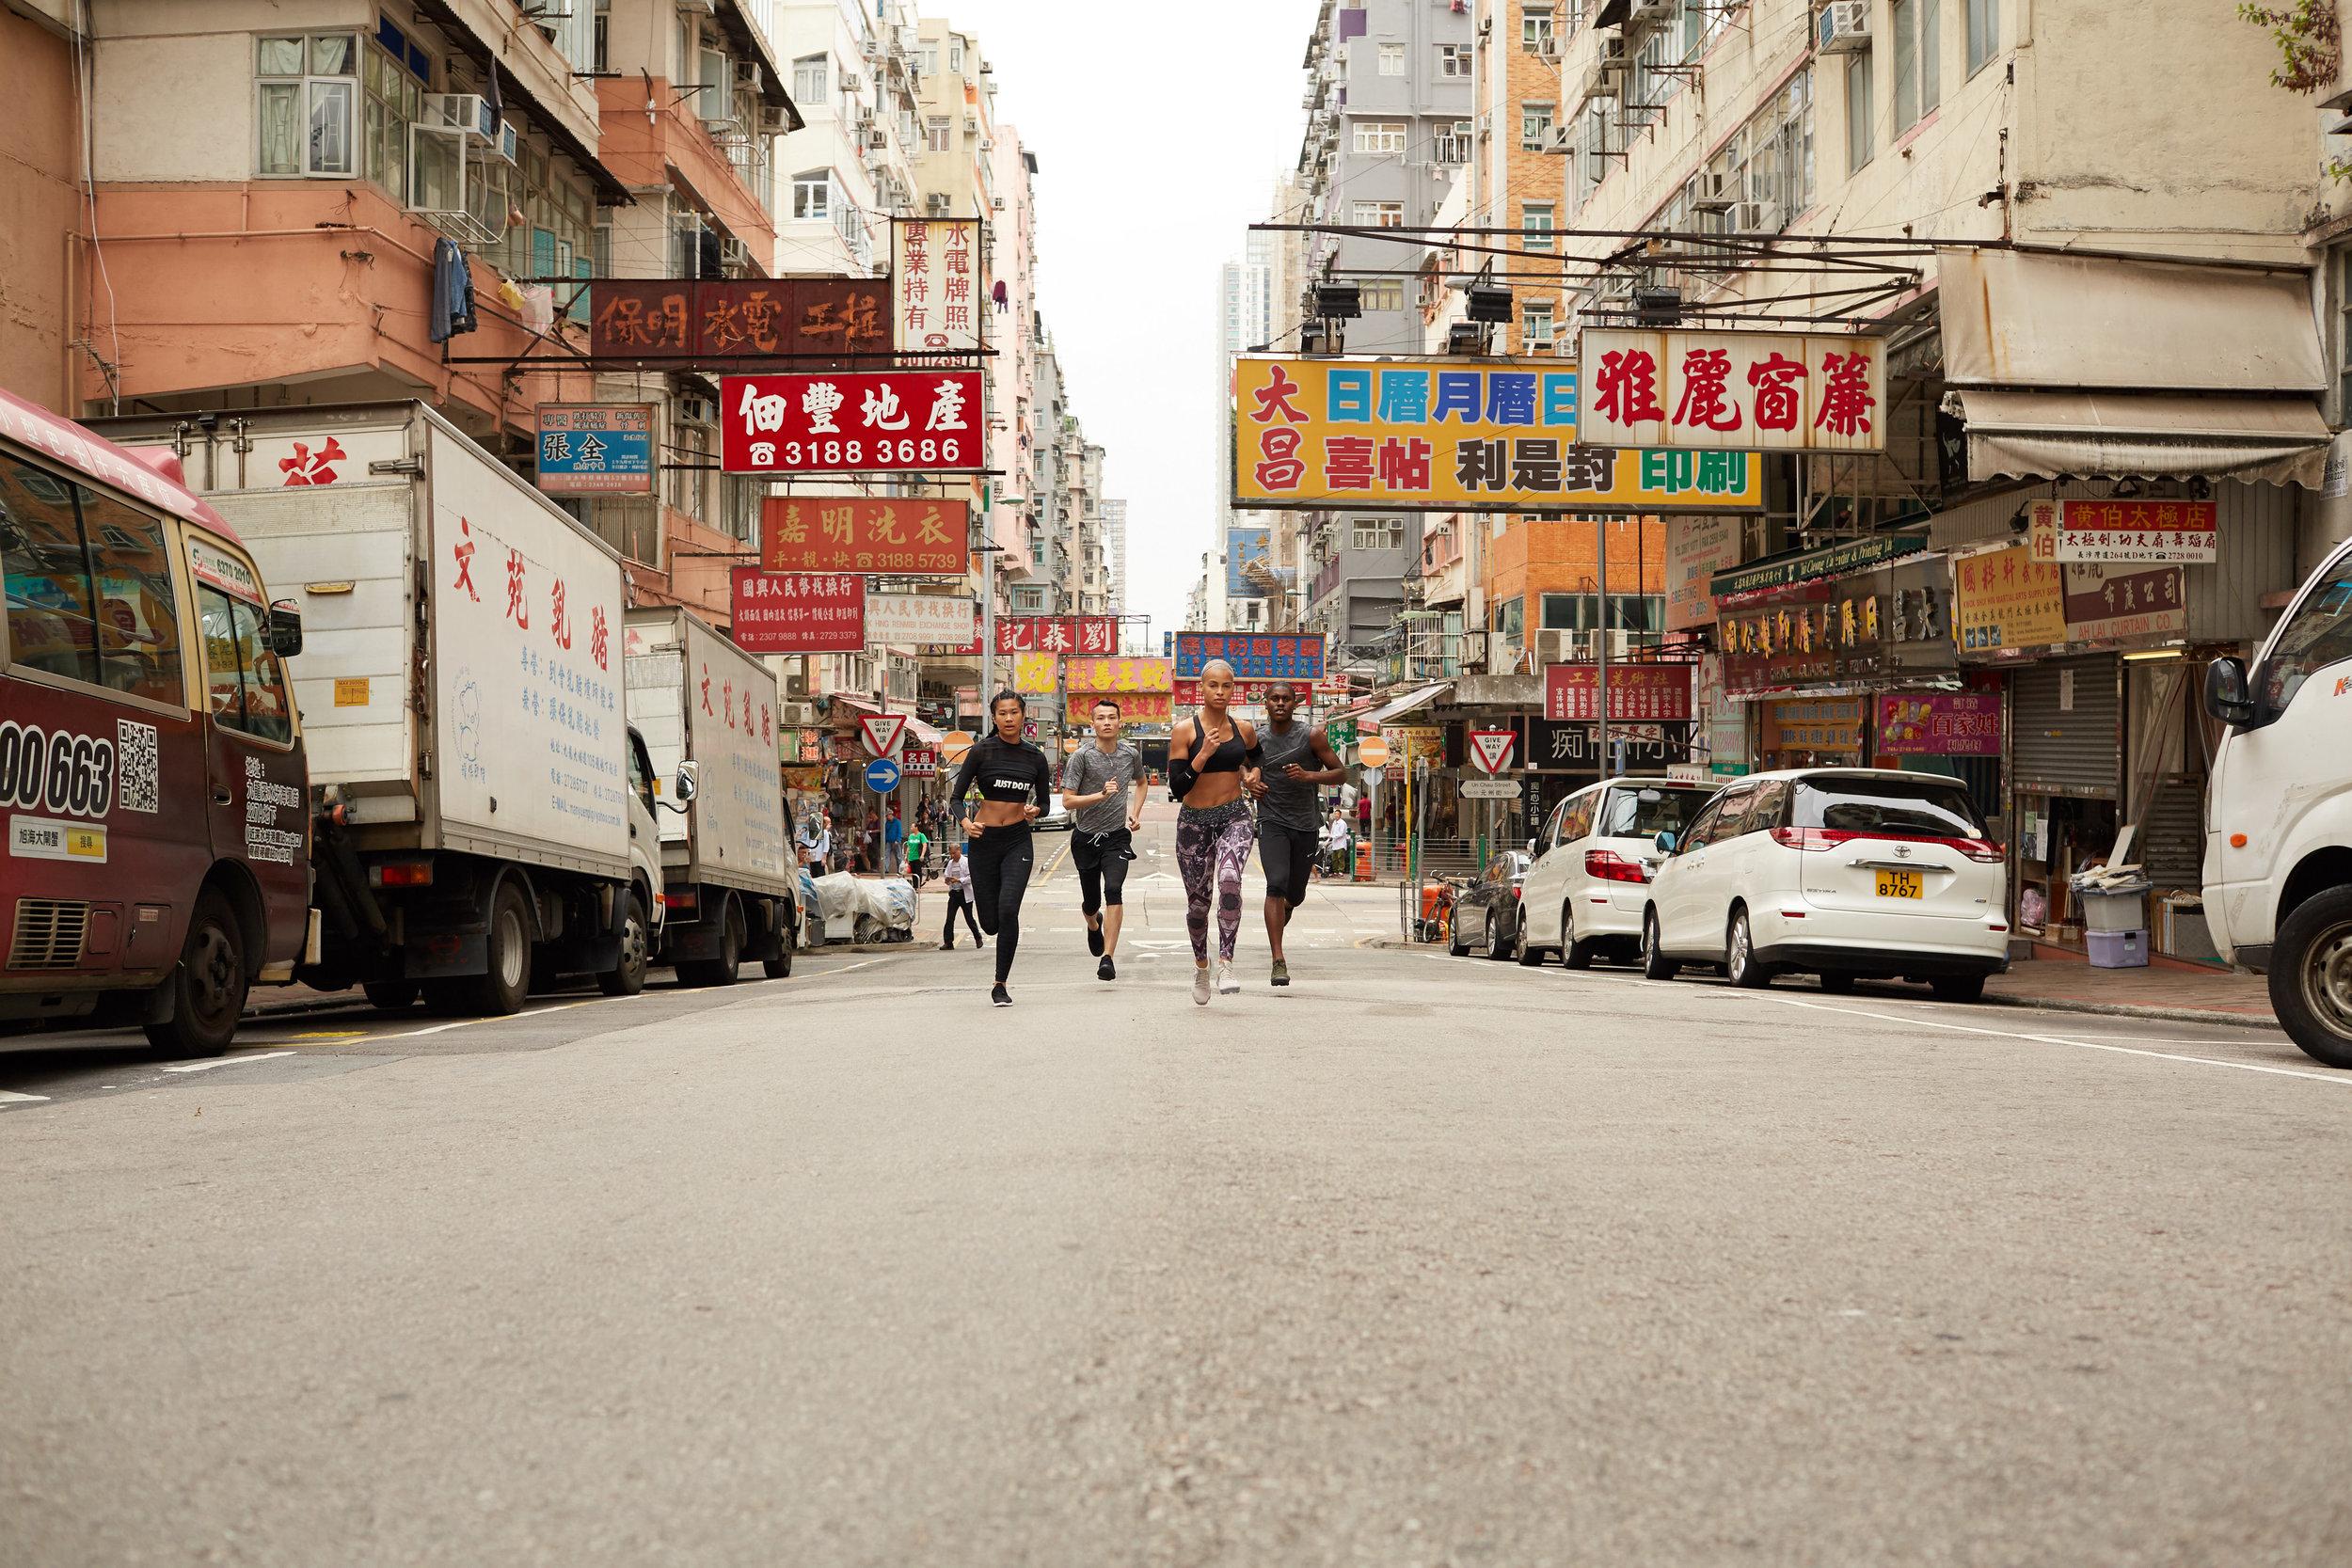 Fa17_Style_Guide_HK_SHAM_SHUI_PO_RUNNING_VAPORMAX1_R7C09009-2978.jpg